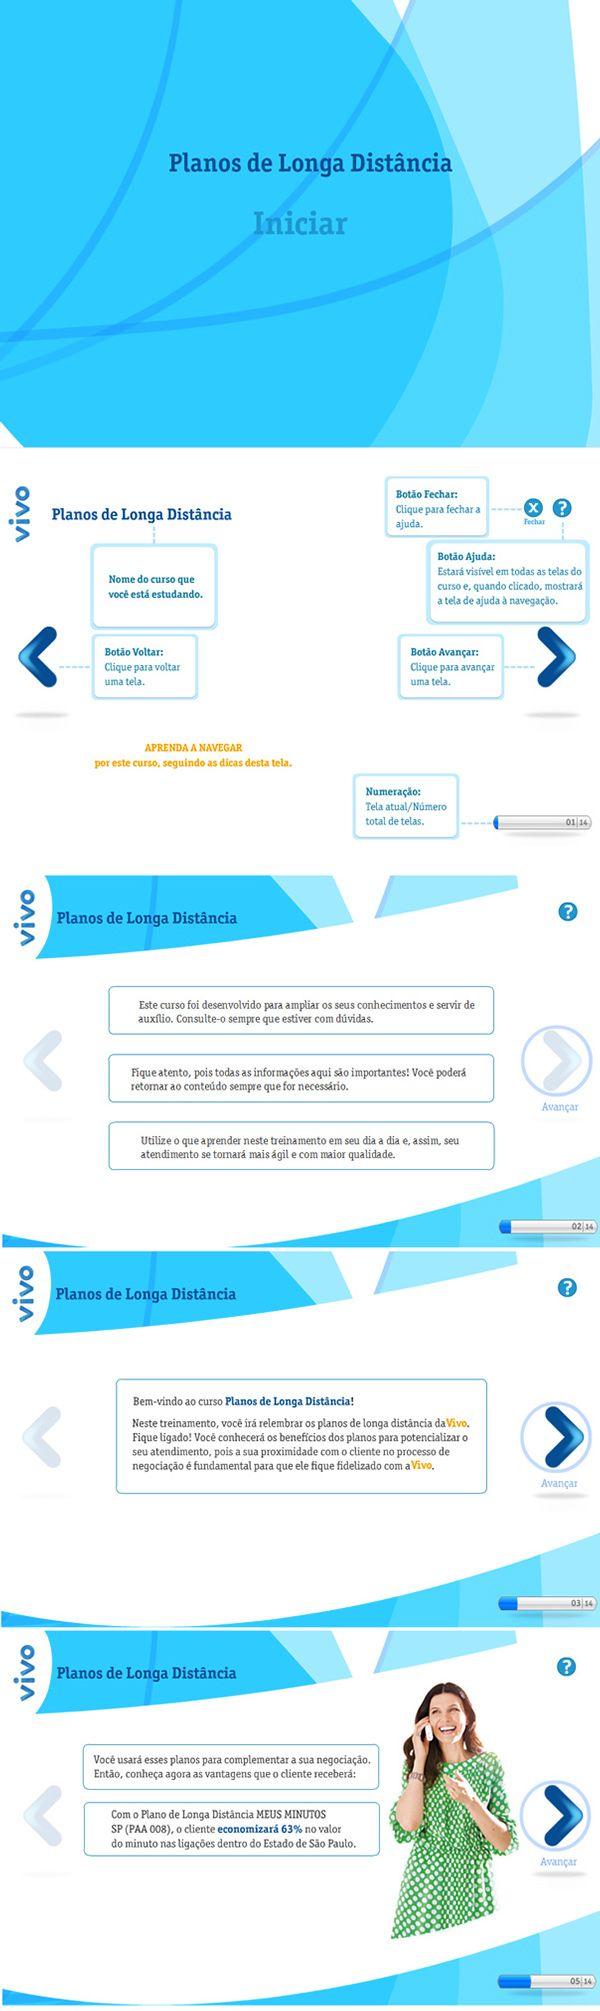 E-learning   Vivo Longa Distância on Behance